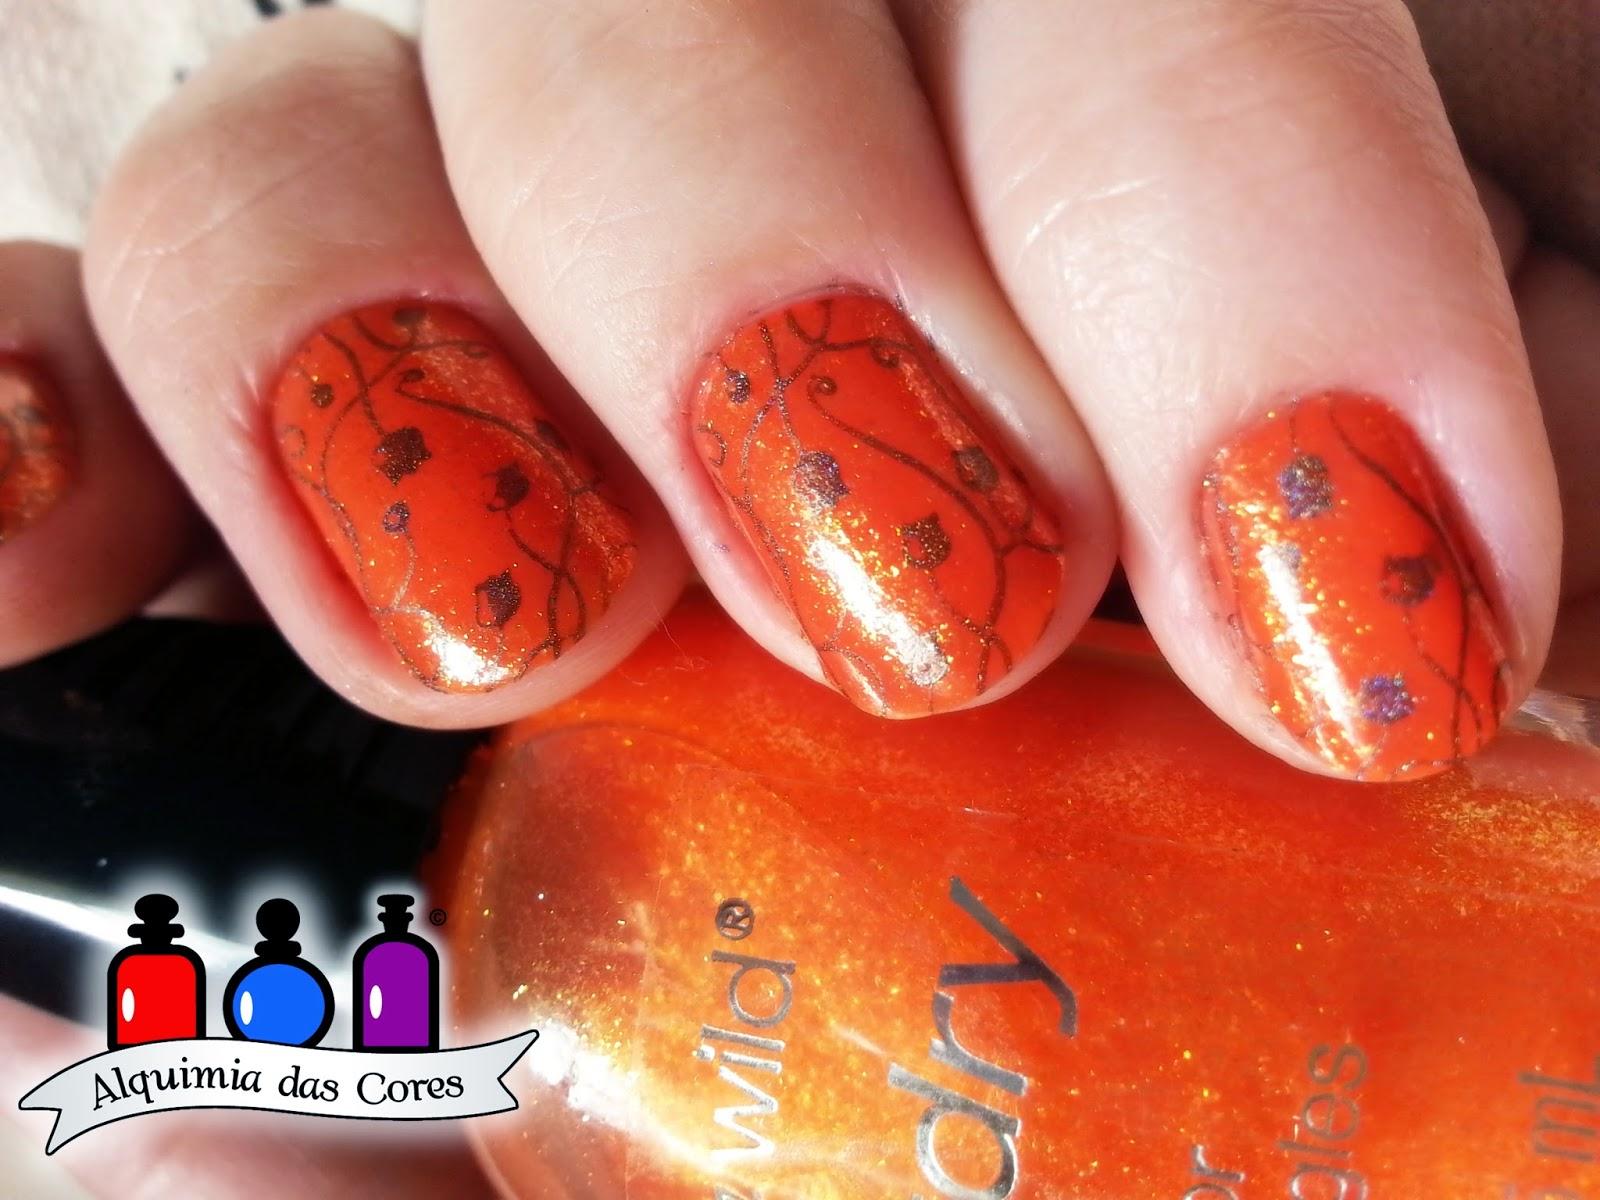 laranja, carimbo, holo